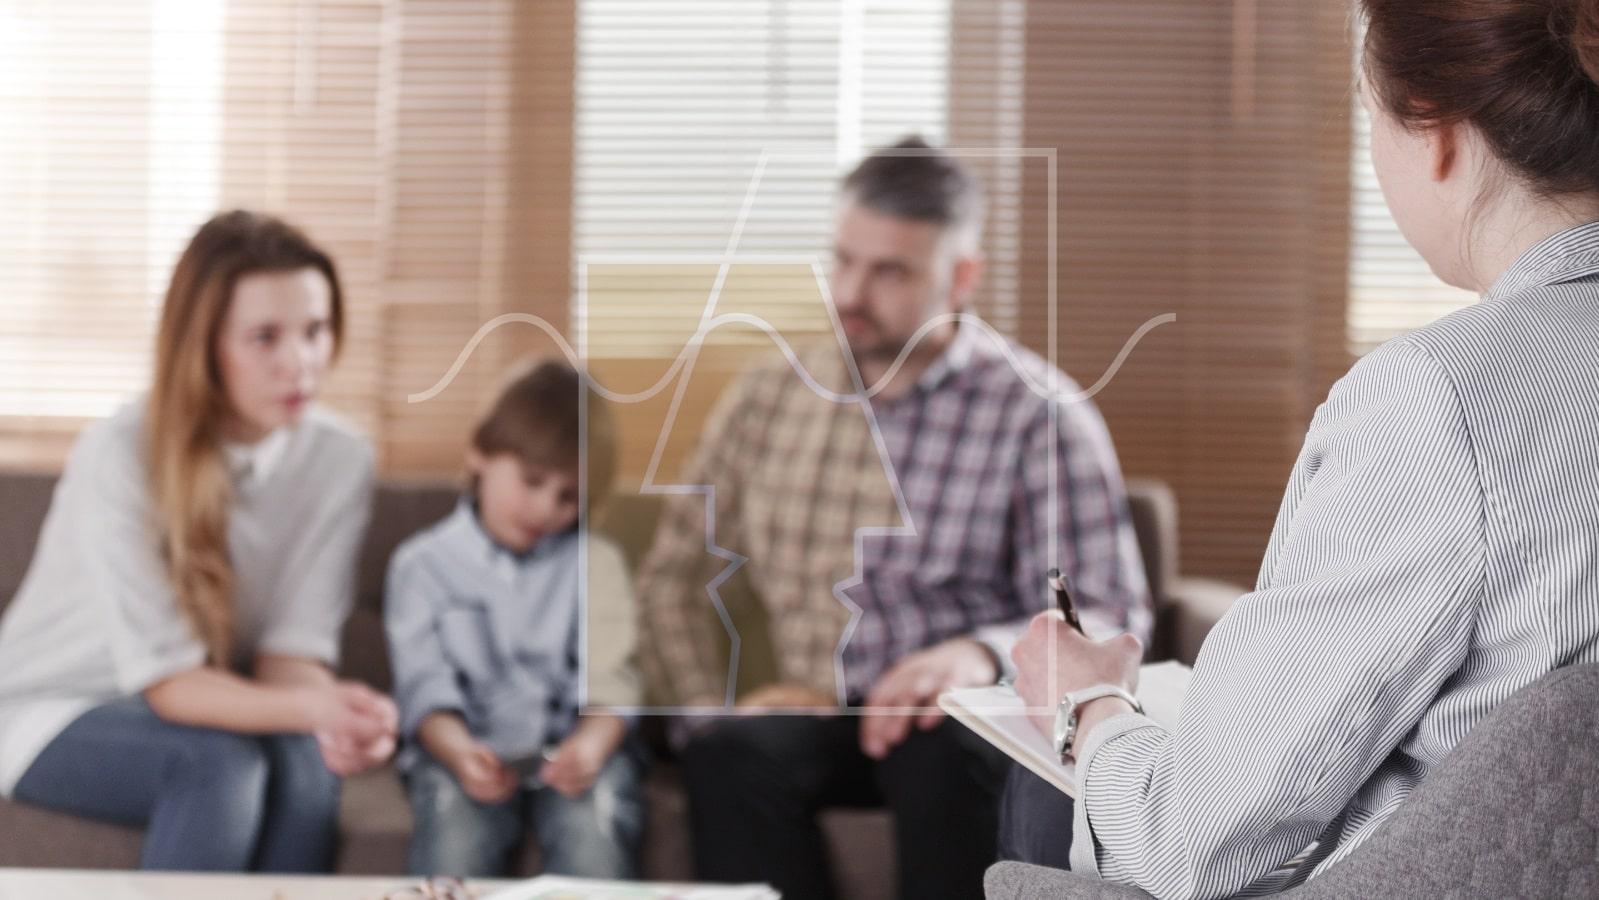 مشاوره با کودکان طلاق